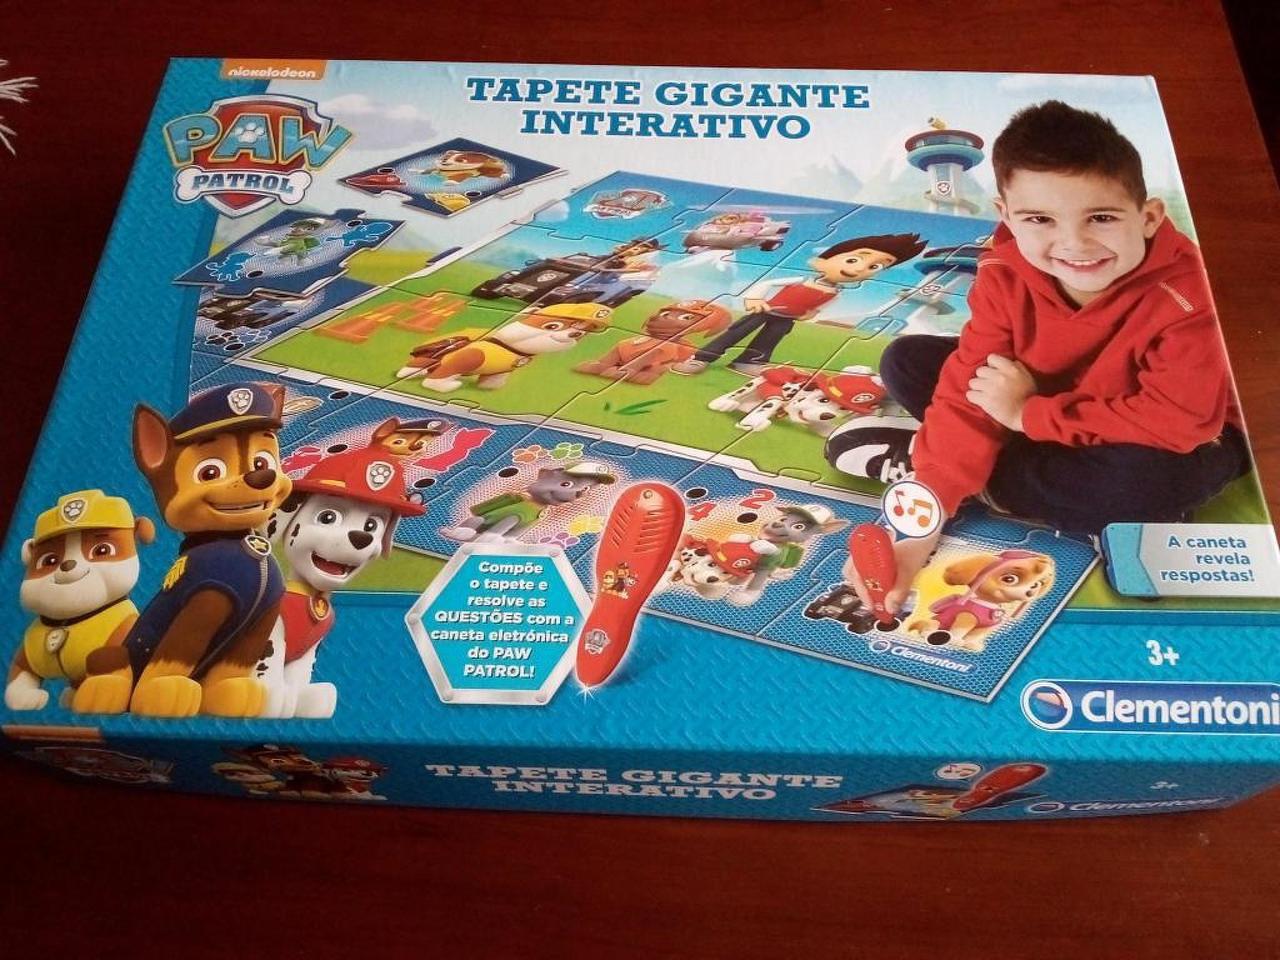 Tapete Gigante Iterativo Paw Patrol / Patrulha Pata, 3+Anos. Novo - 4/4